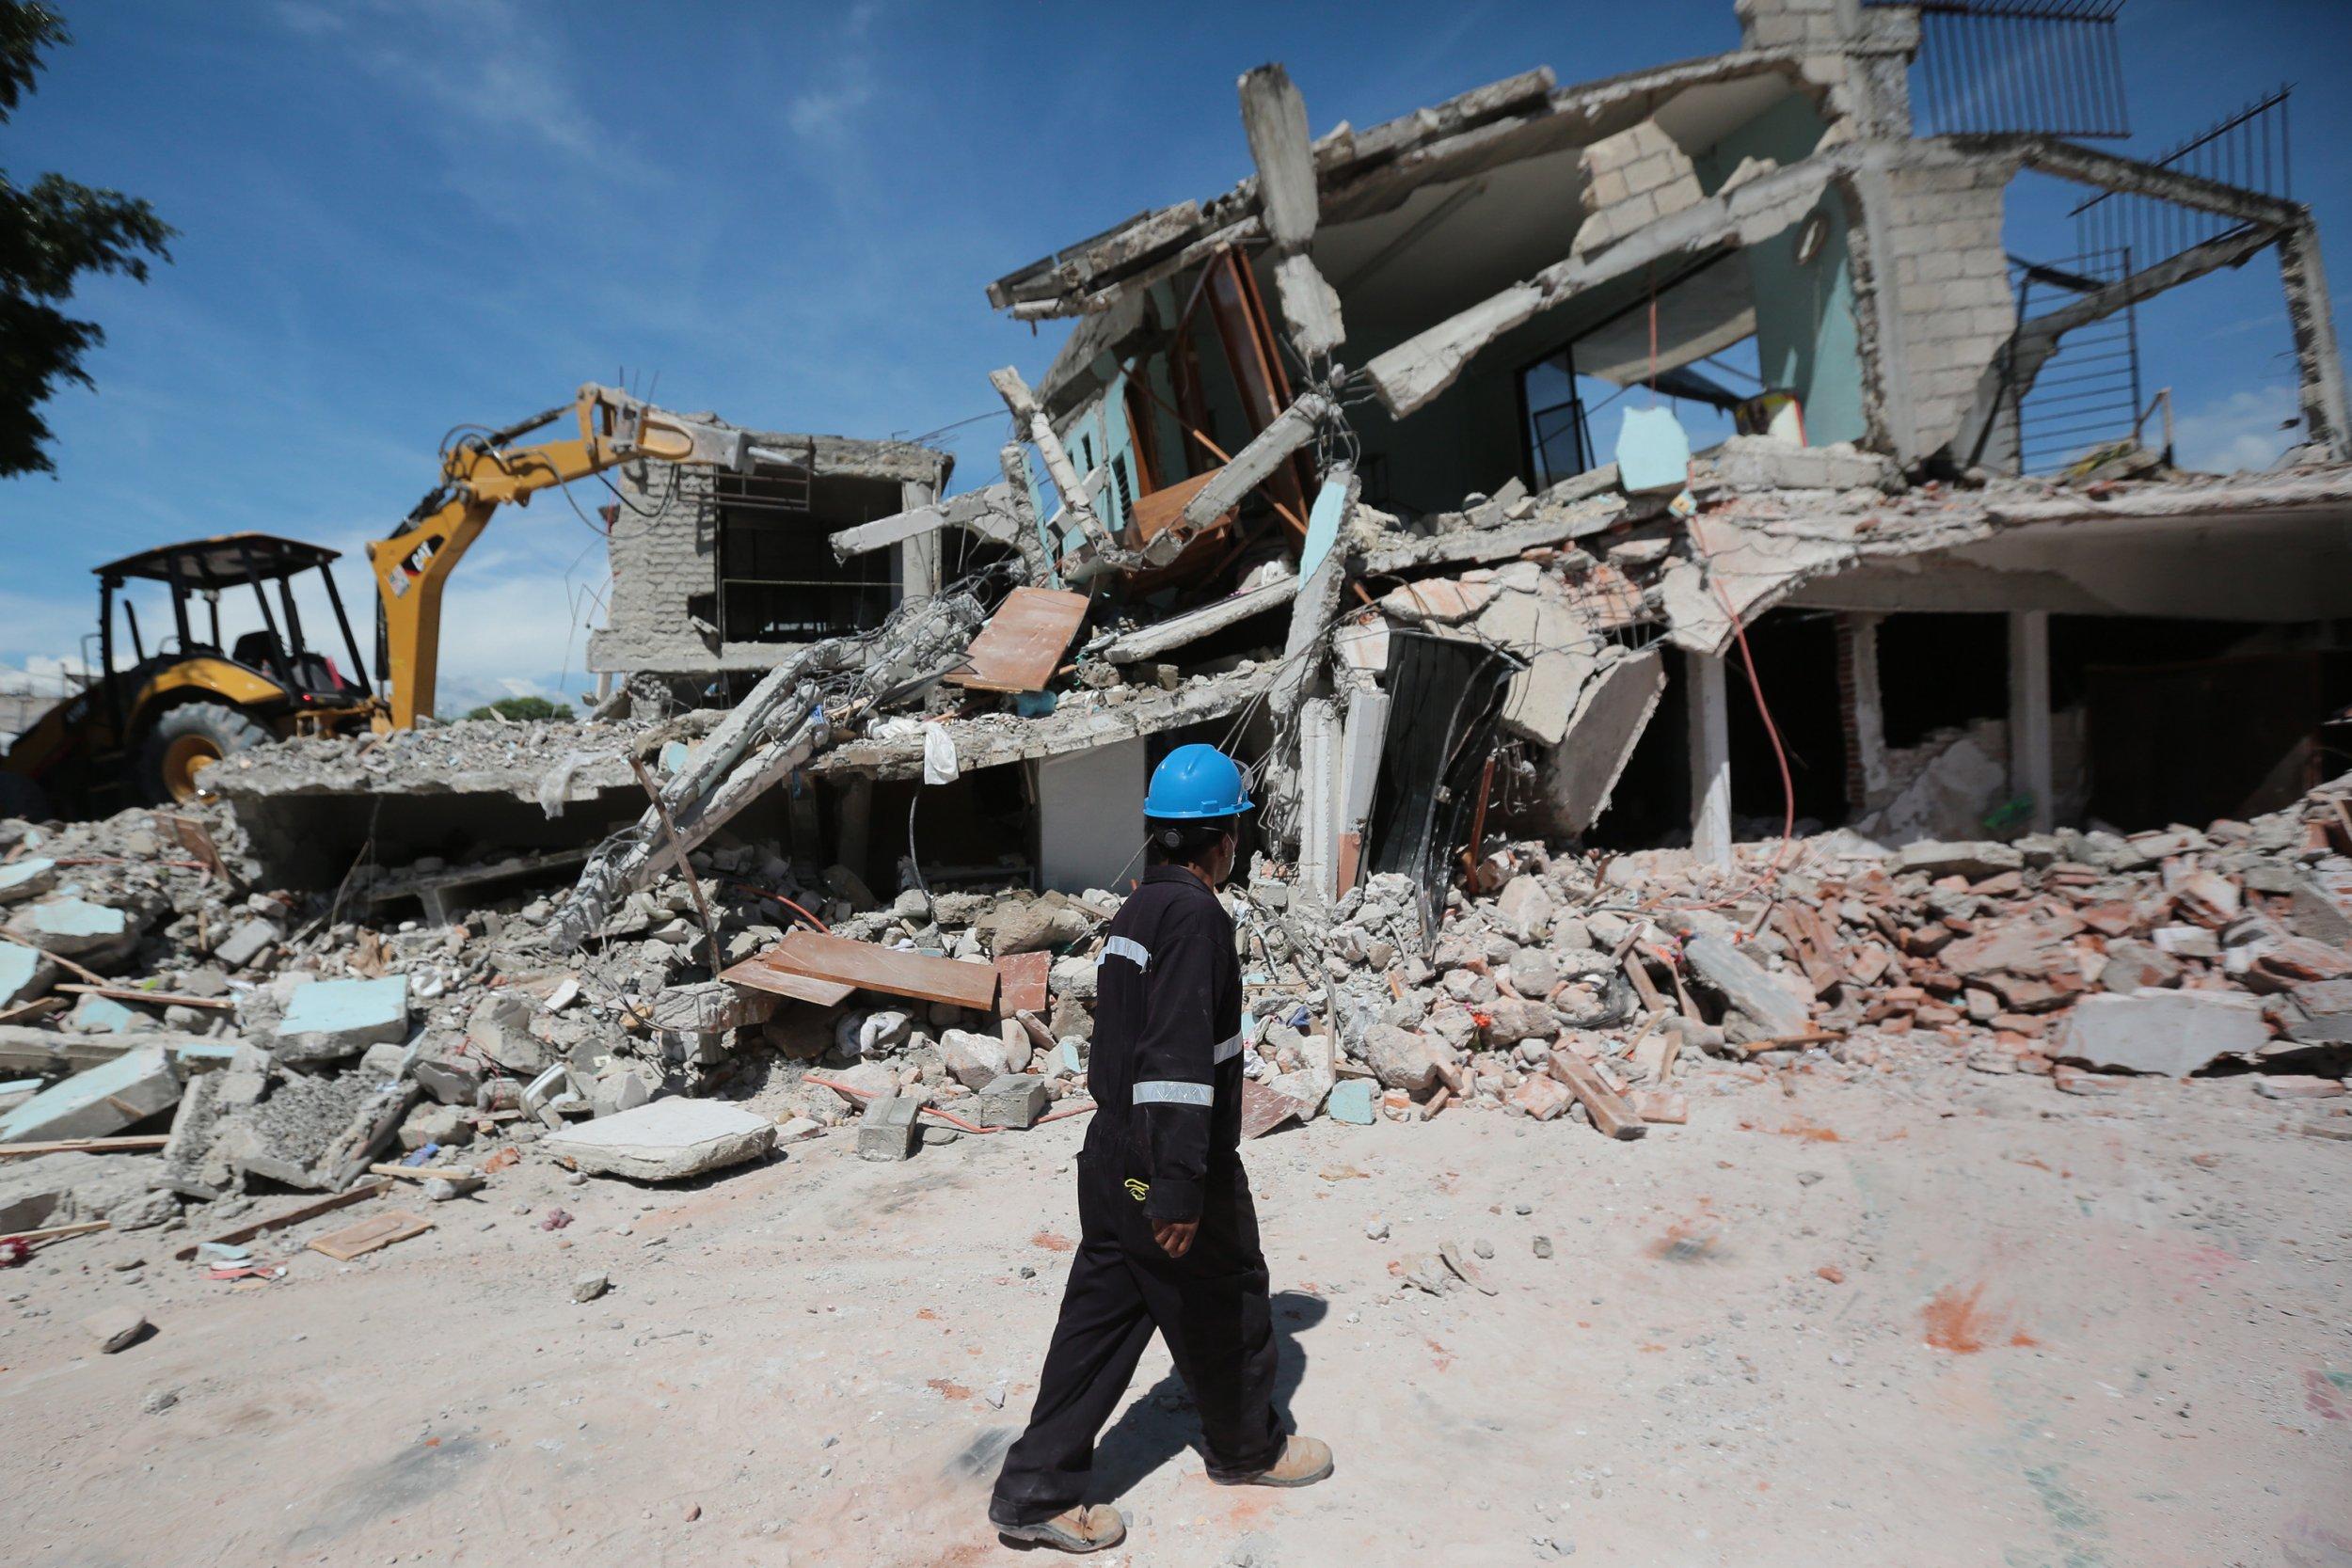 10_24_mexico_earthquake_damage